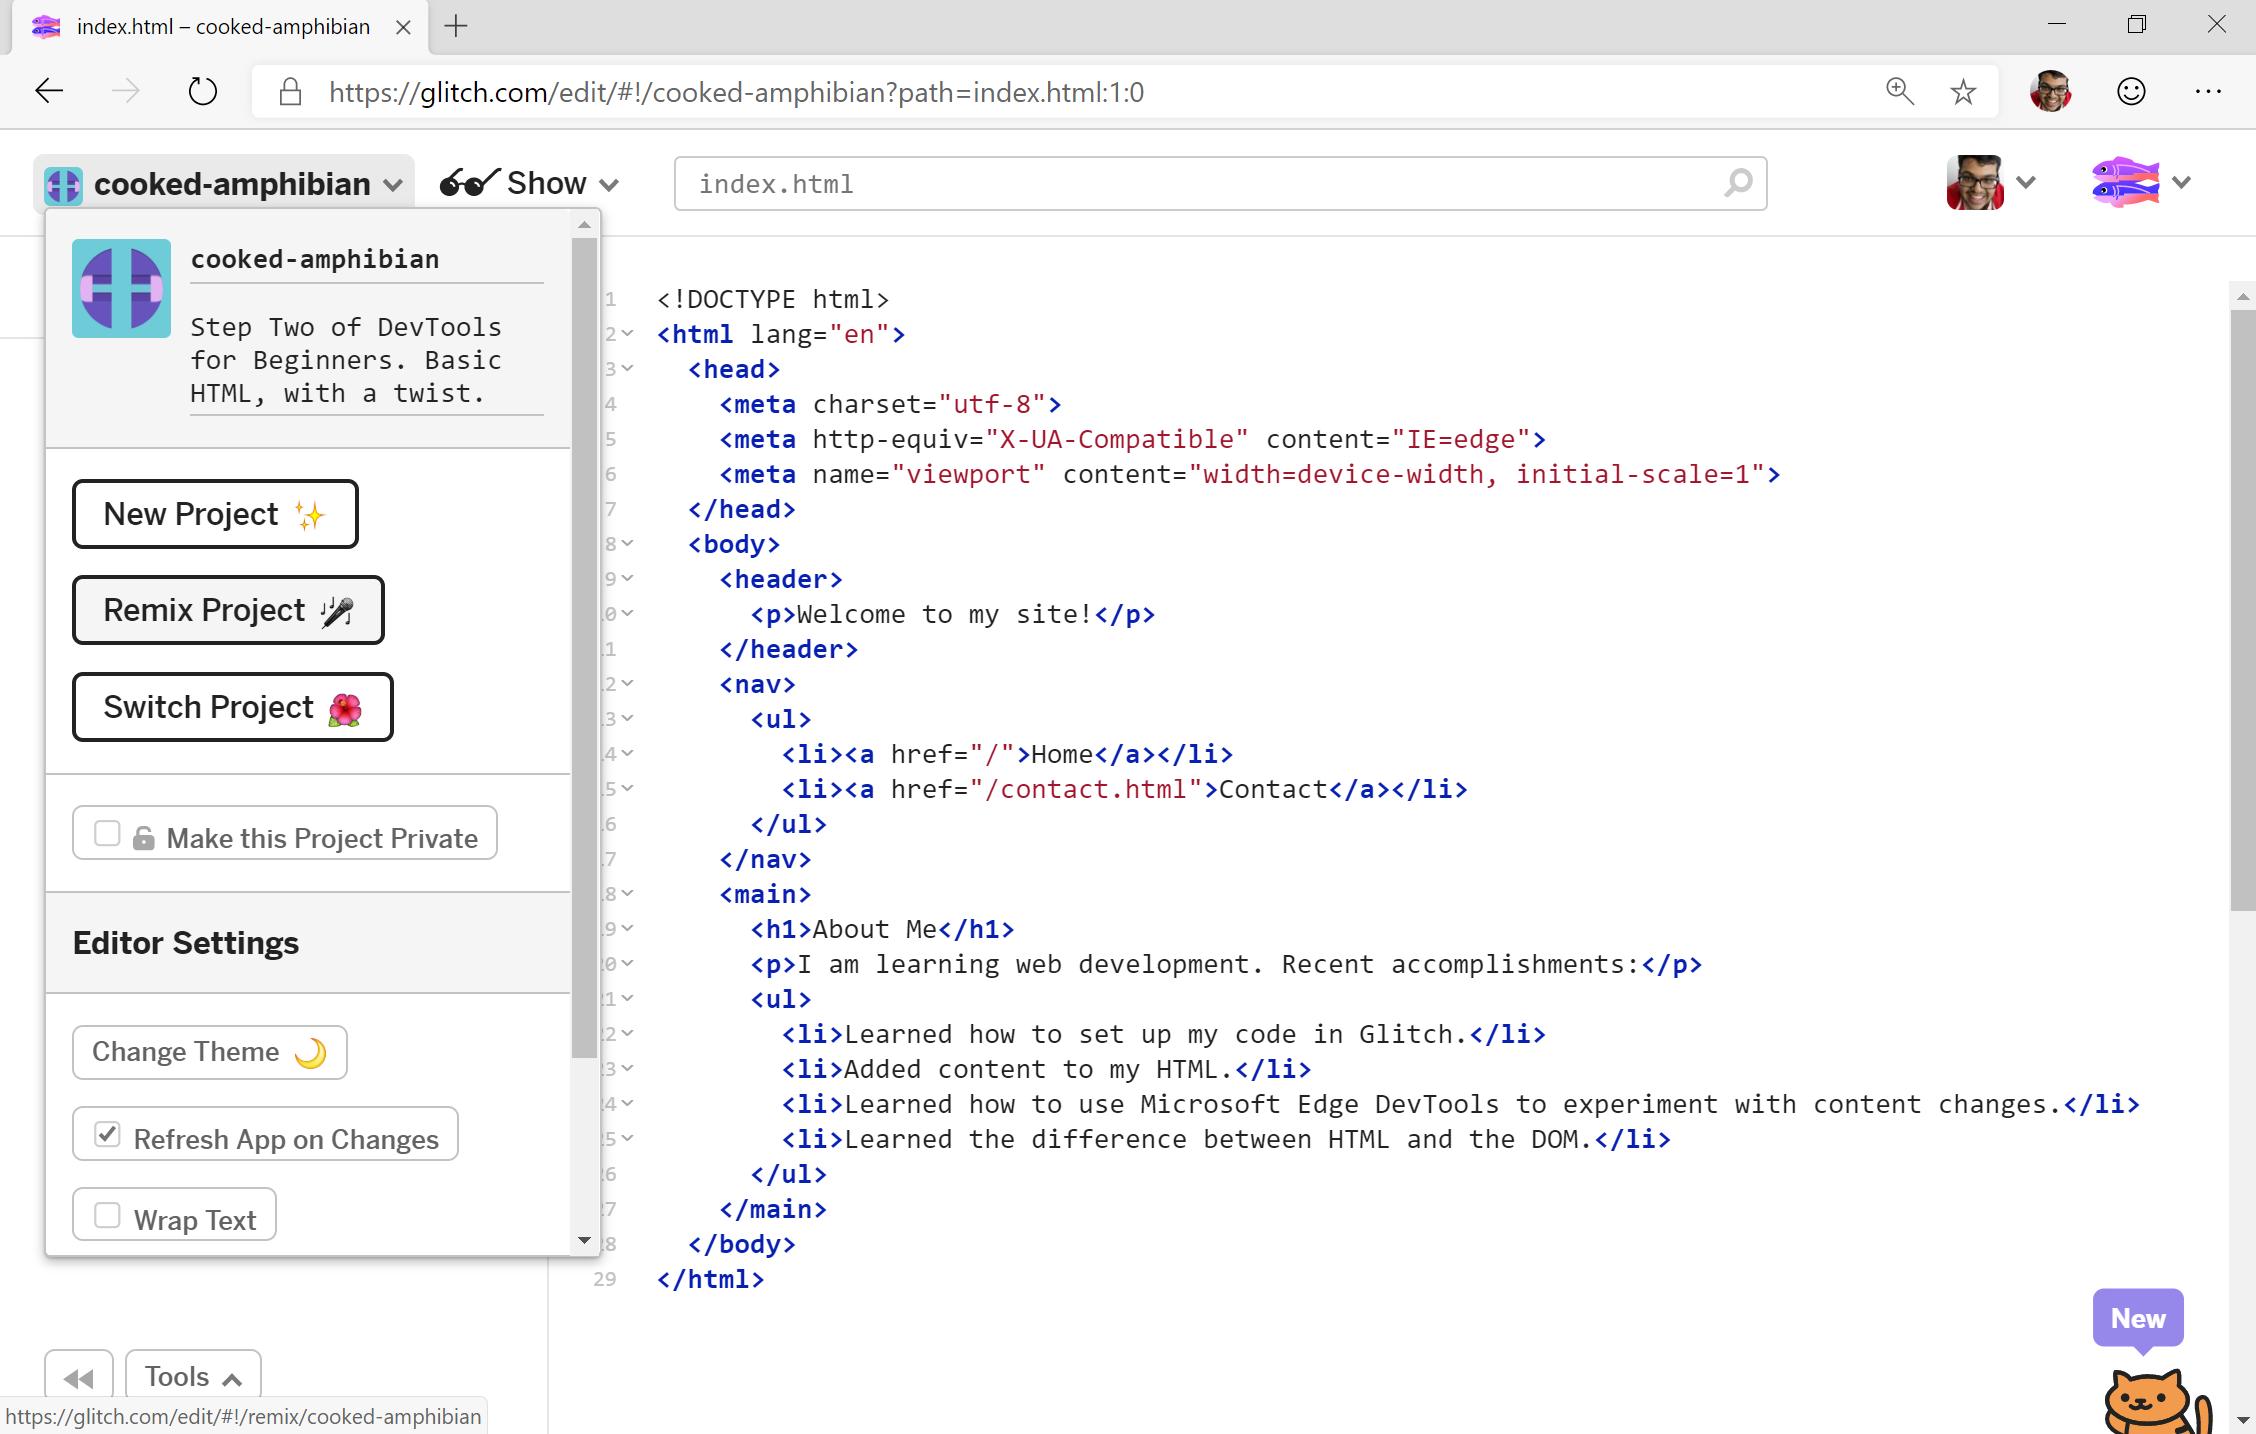 DevTools for Beginners - Microsoft Edge Development